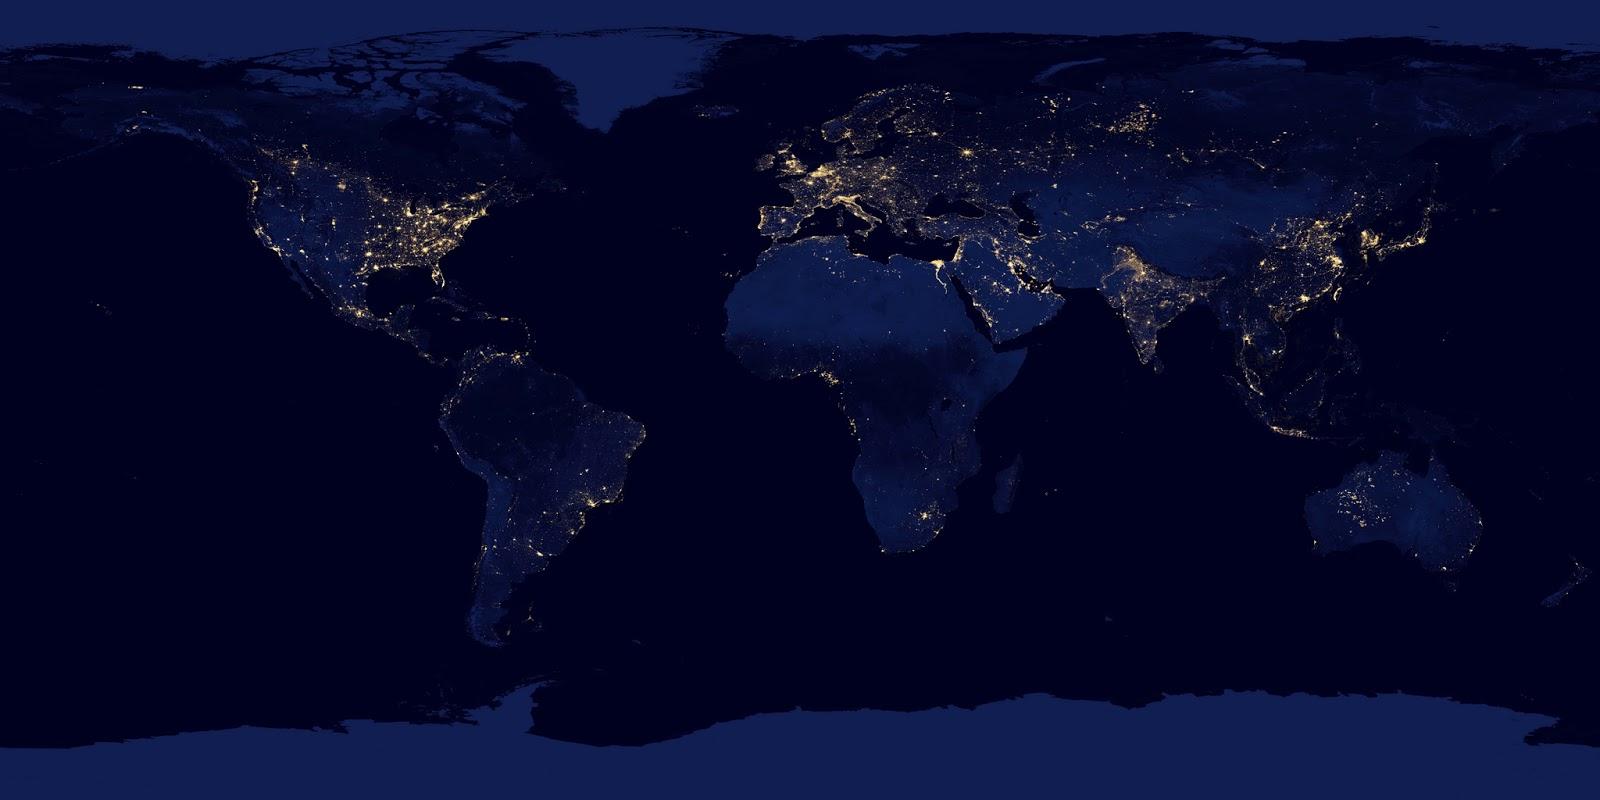 mundo de noche: